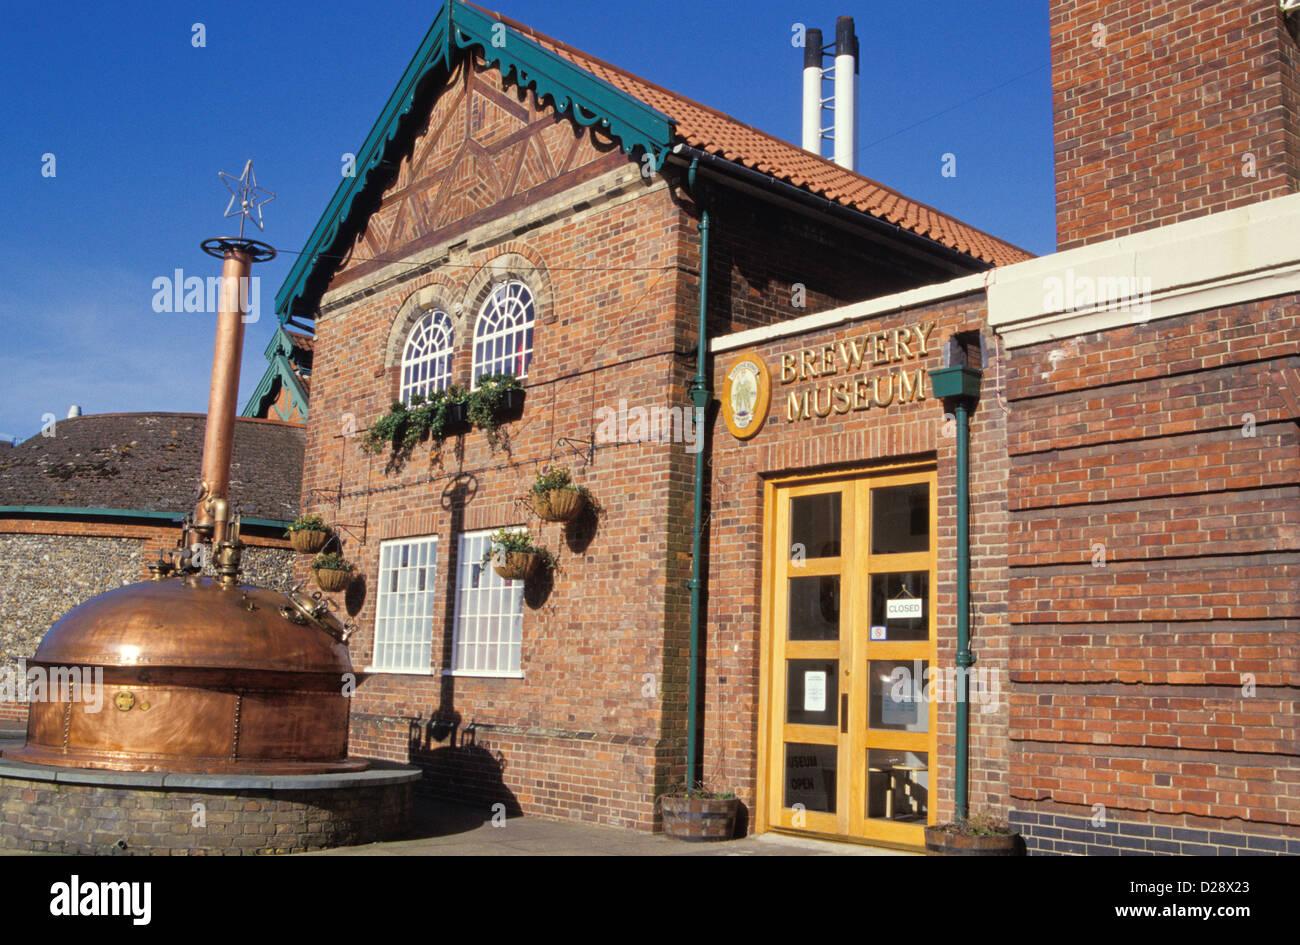 England. Bury St. Edmunds. Greene King Brewery Museum. - Stock Image